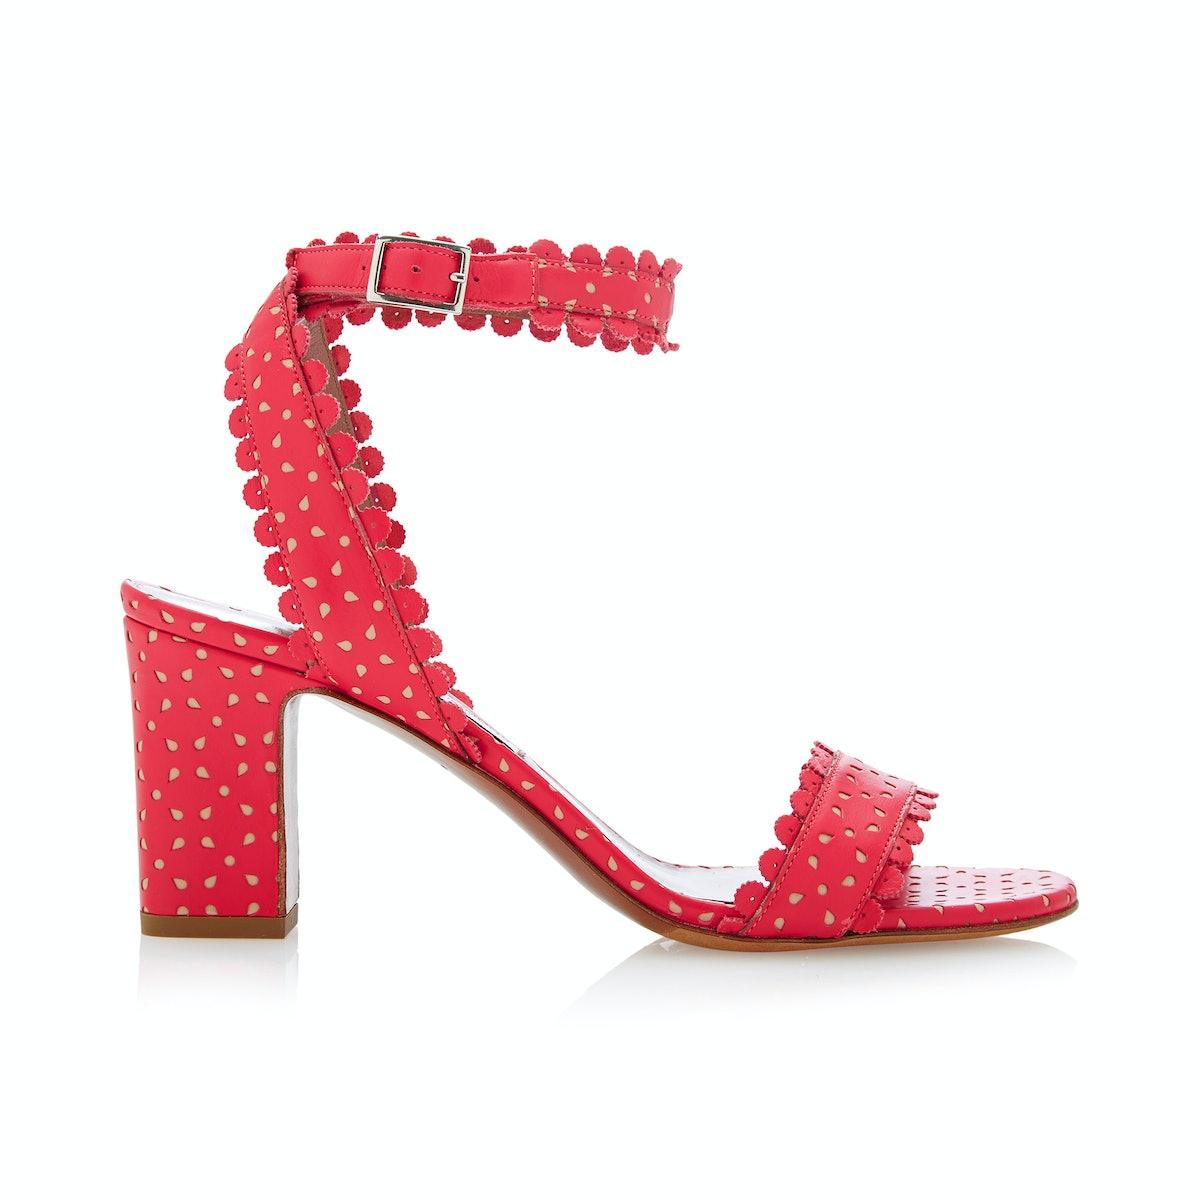 Tabitha Simmons sandal